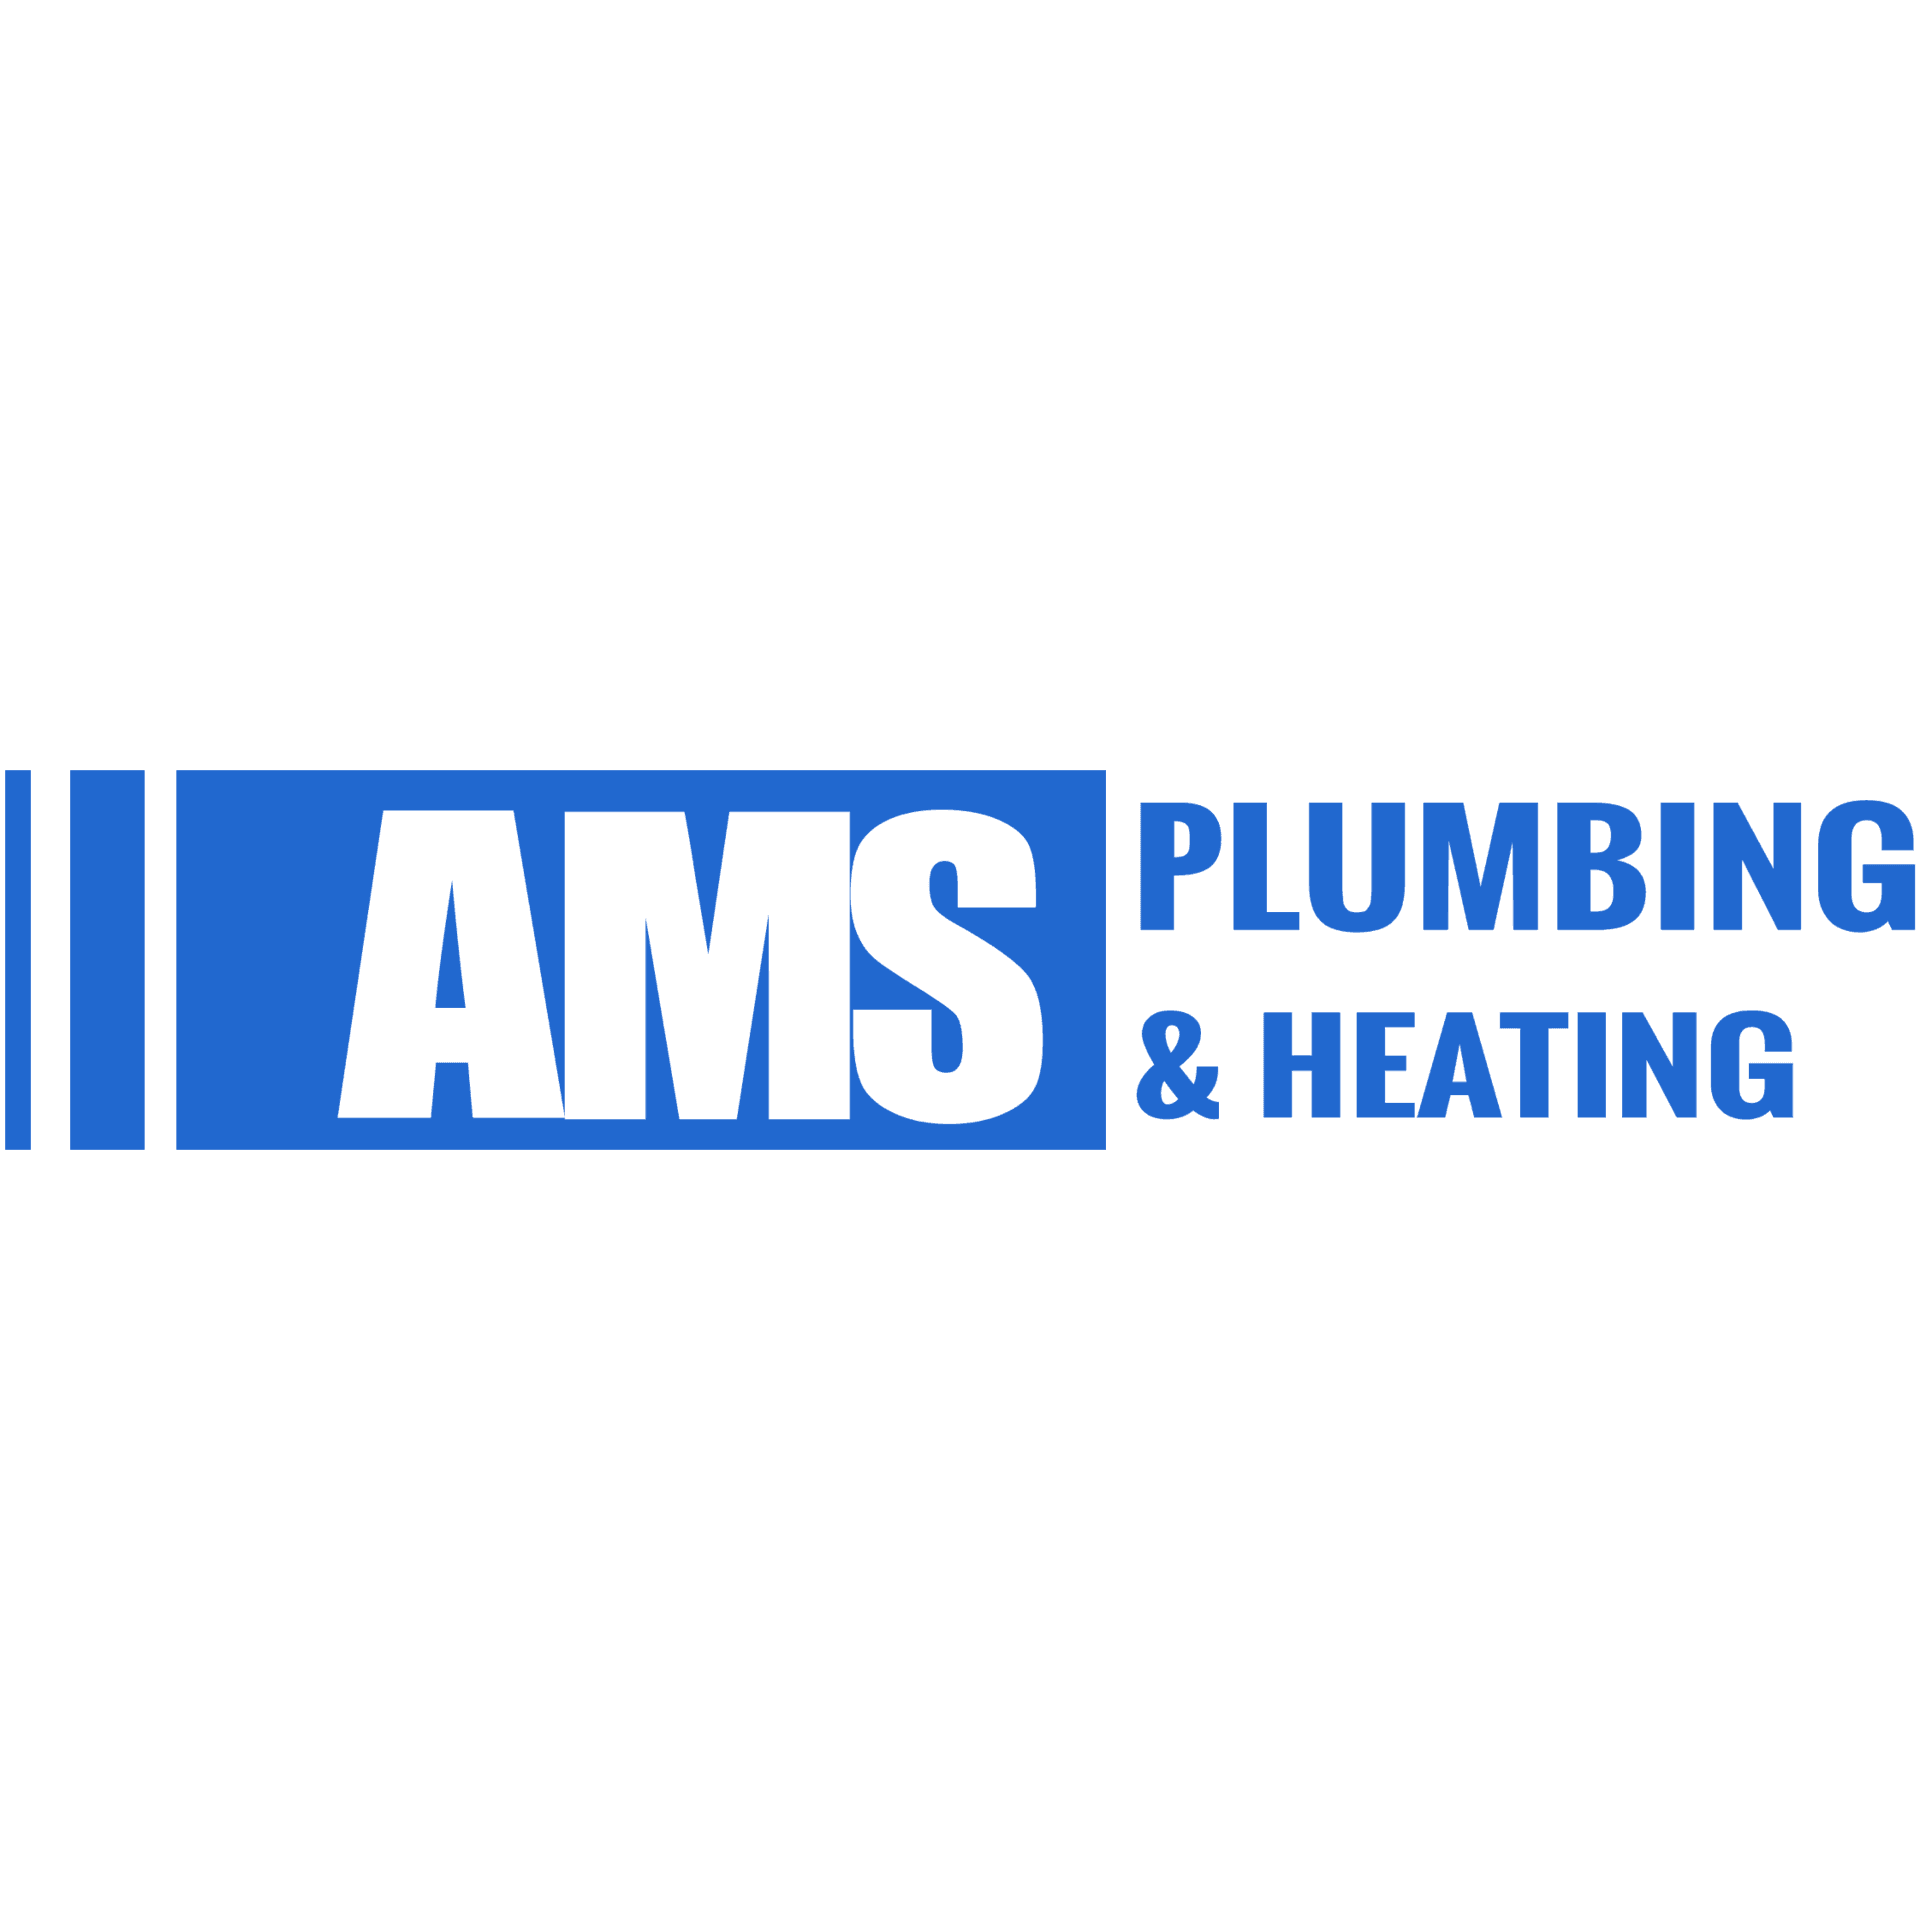 AMS Plumbing & Heating - Lisburn, Kent BT27 5DJ - 07854 638122 | ShowMeLocal.com